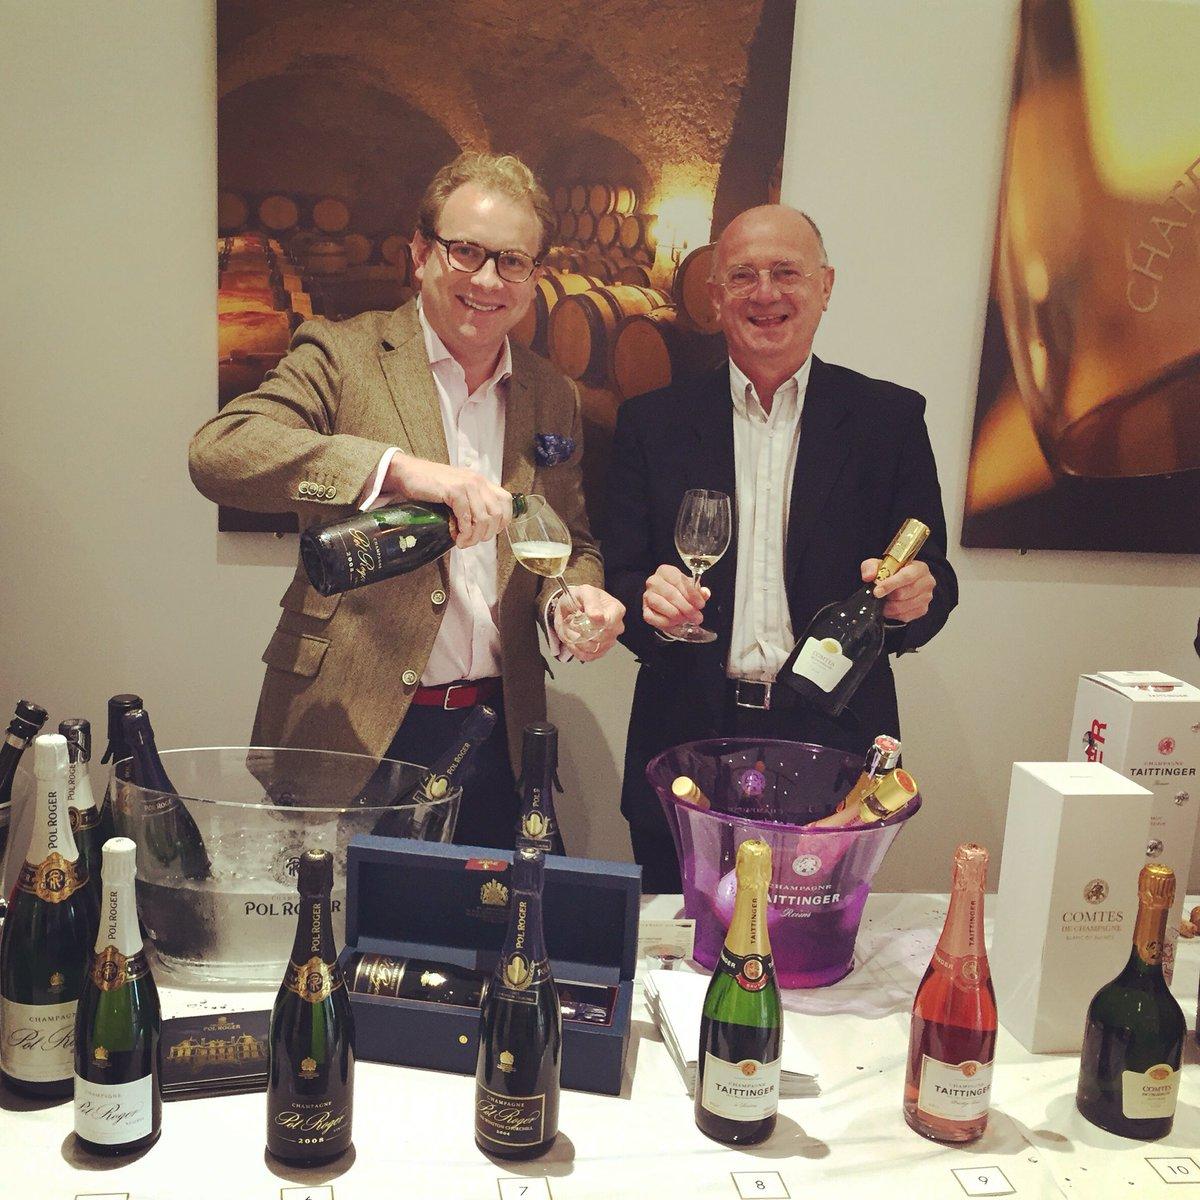 Fancy a taste of @pr_portfolio or @TaittingerUK ? #champagne #winelover <br>http://pic.twitter.com/Z5vYMyGtBX